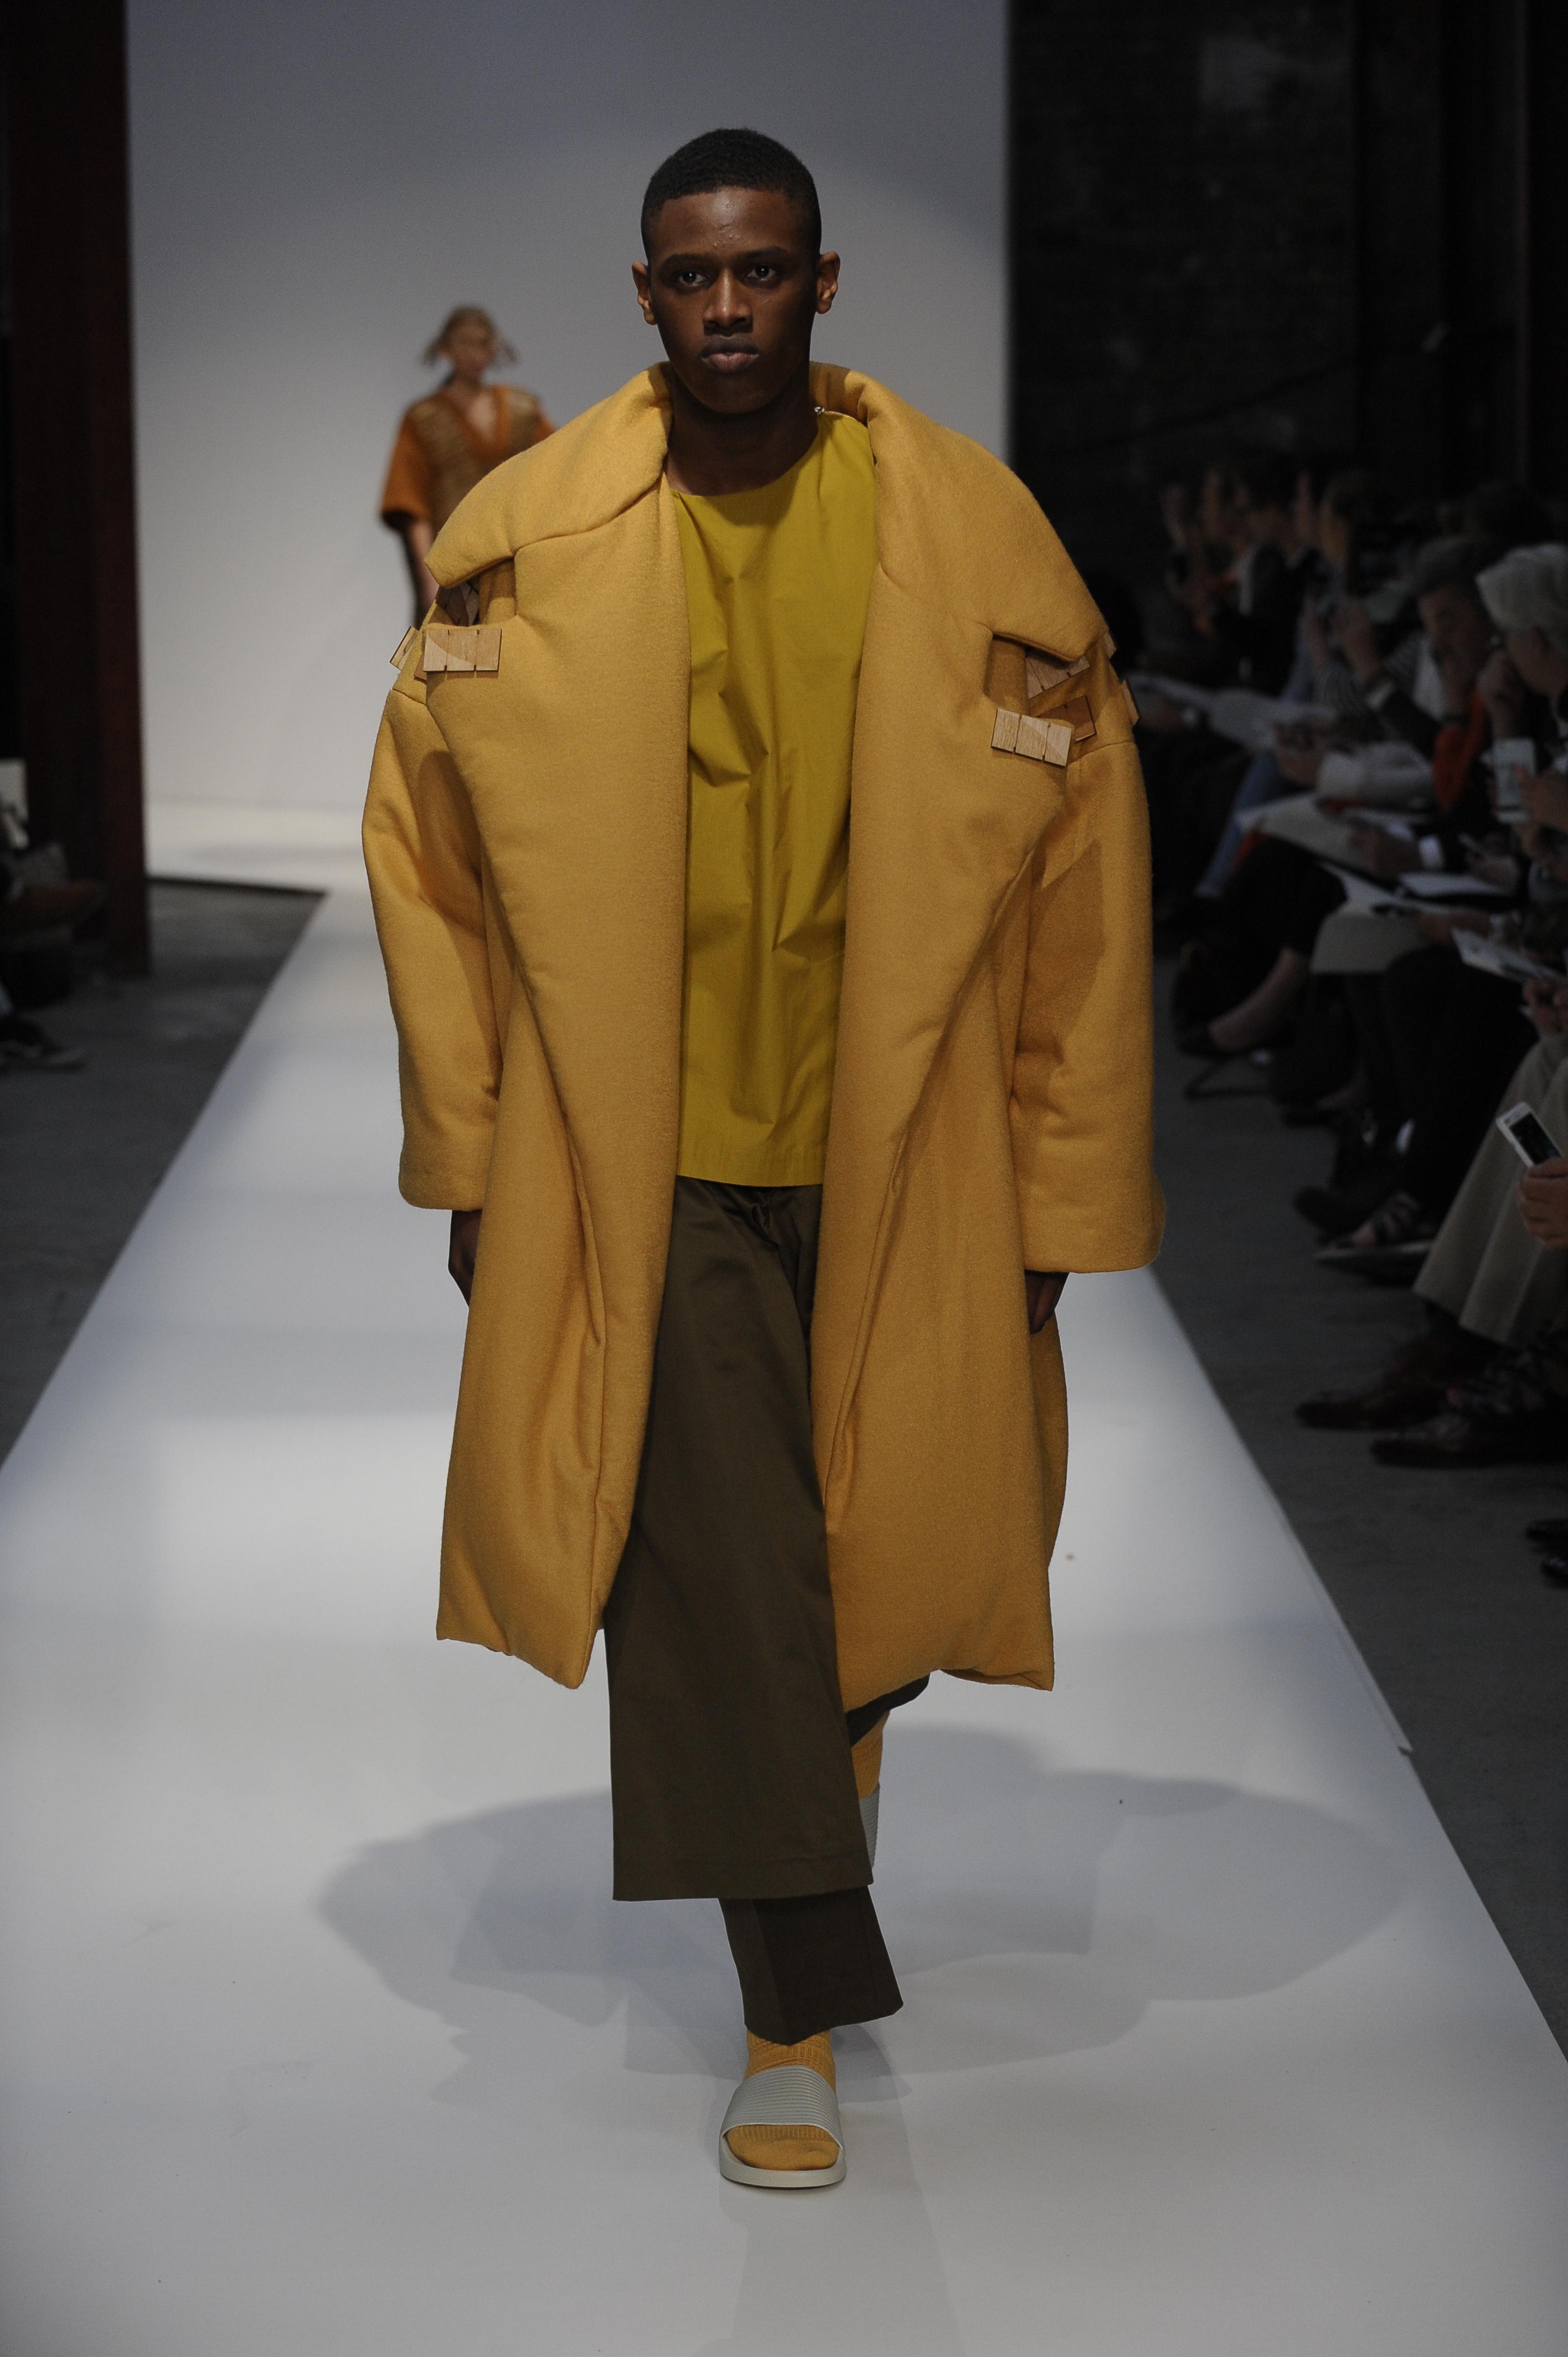 London College of Fashion 2015 Fashion Show